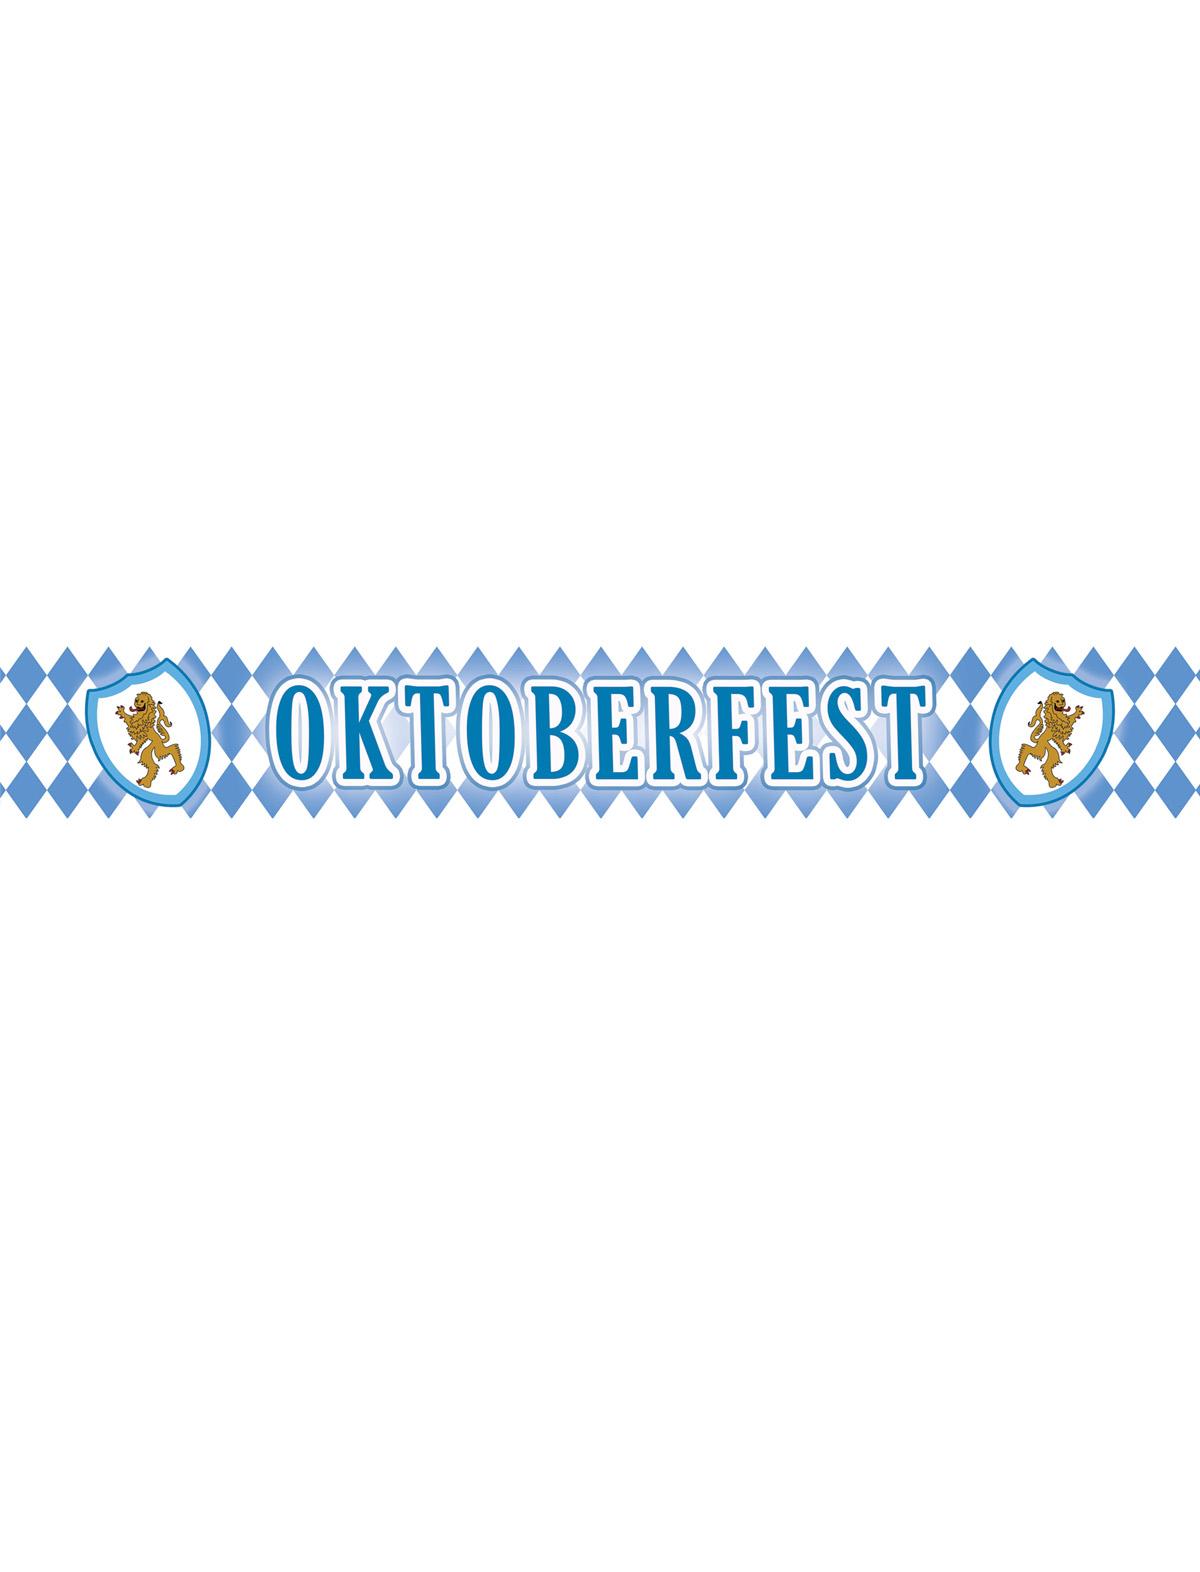 Absperrband Oktoberfest